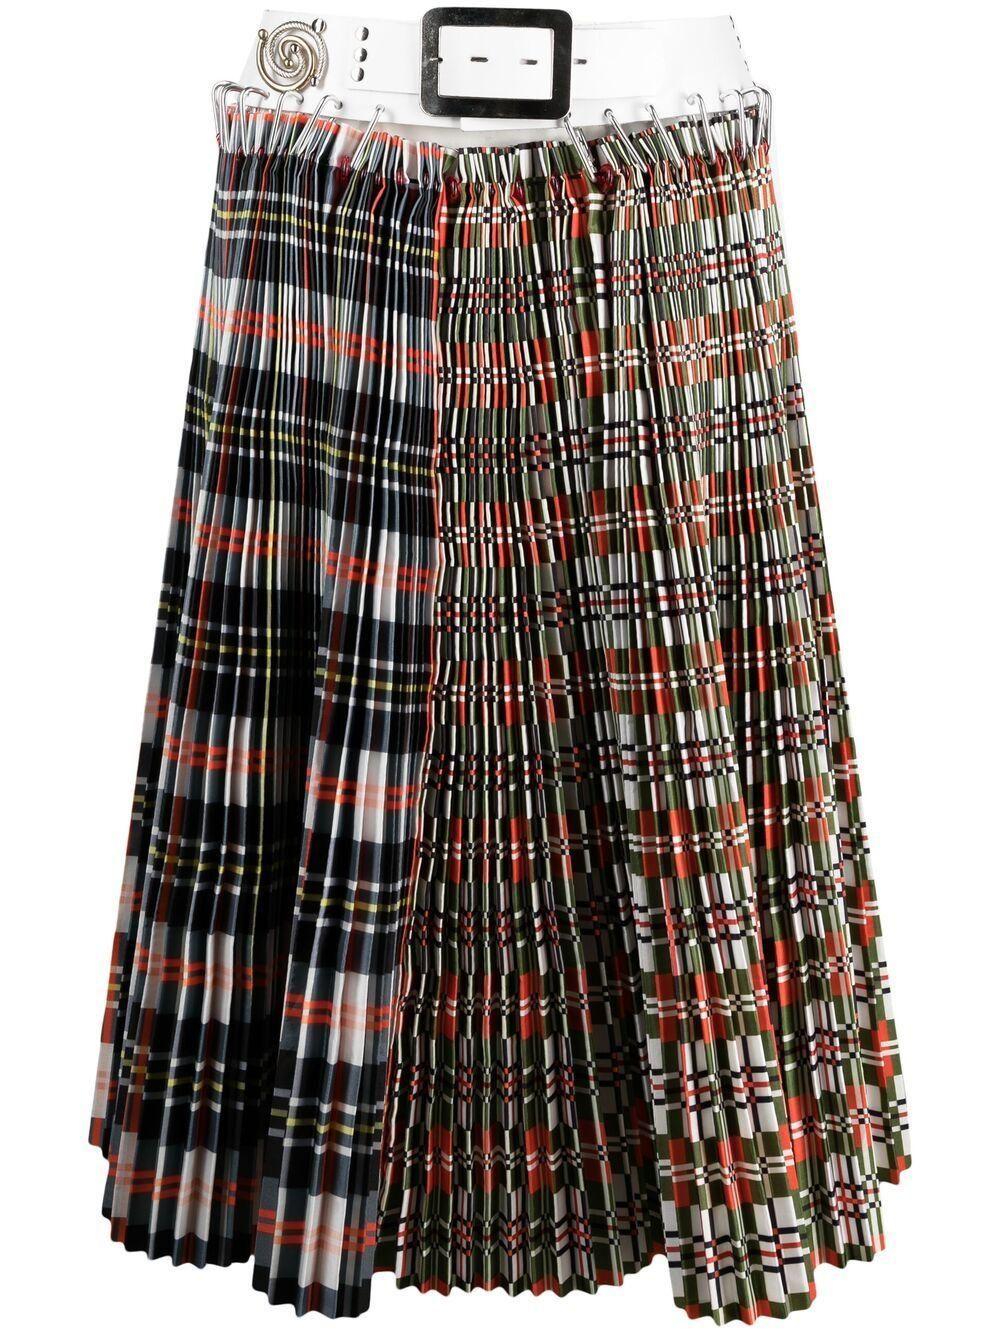 Double Plaid Pleated Skirt